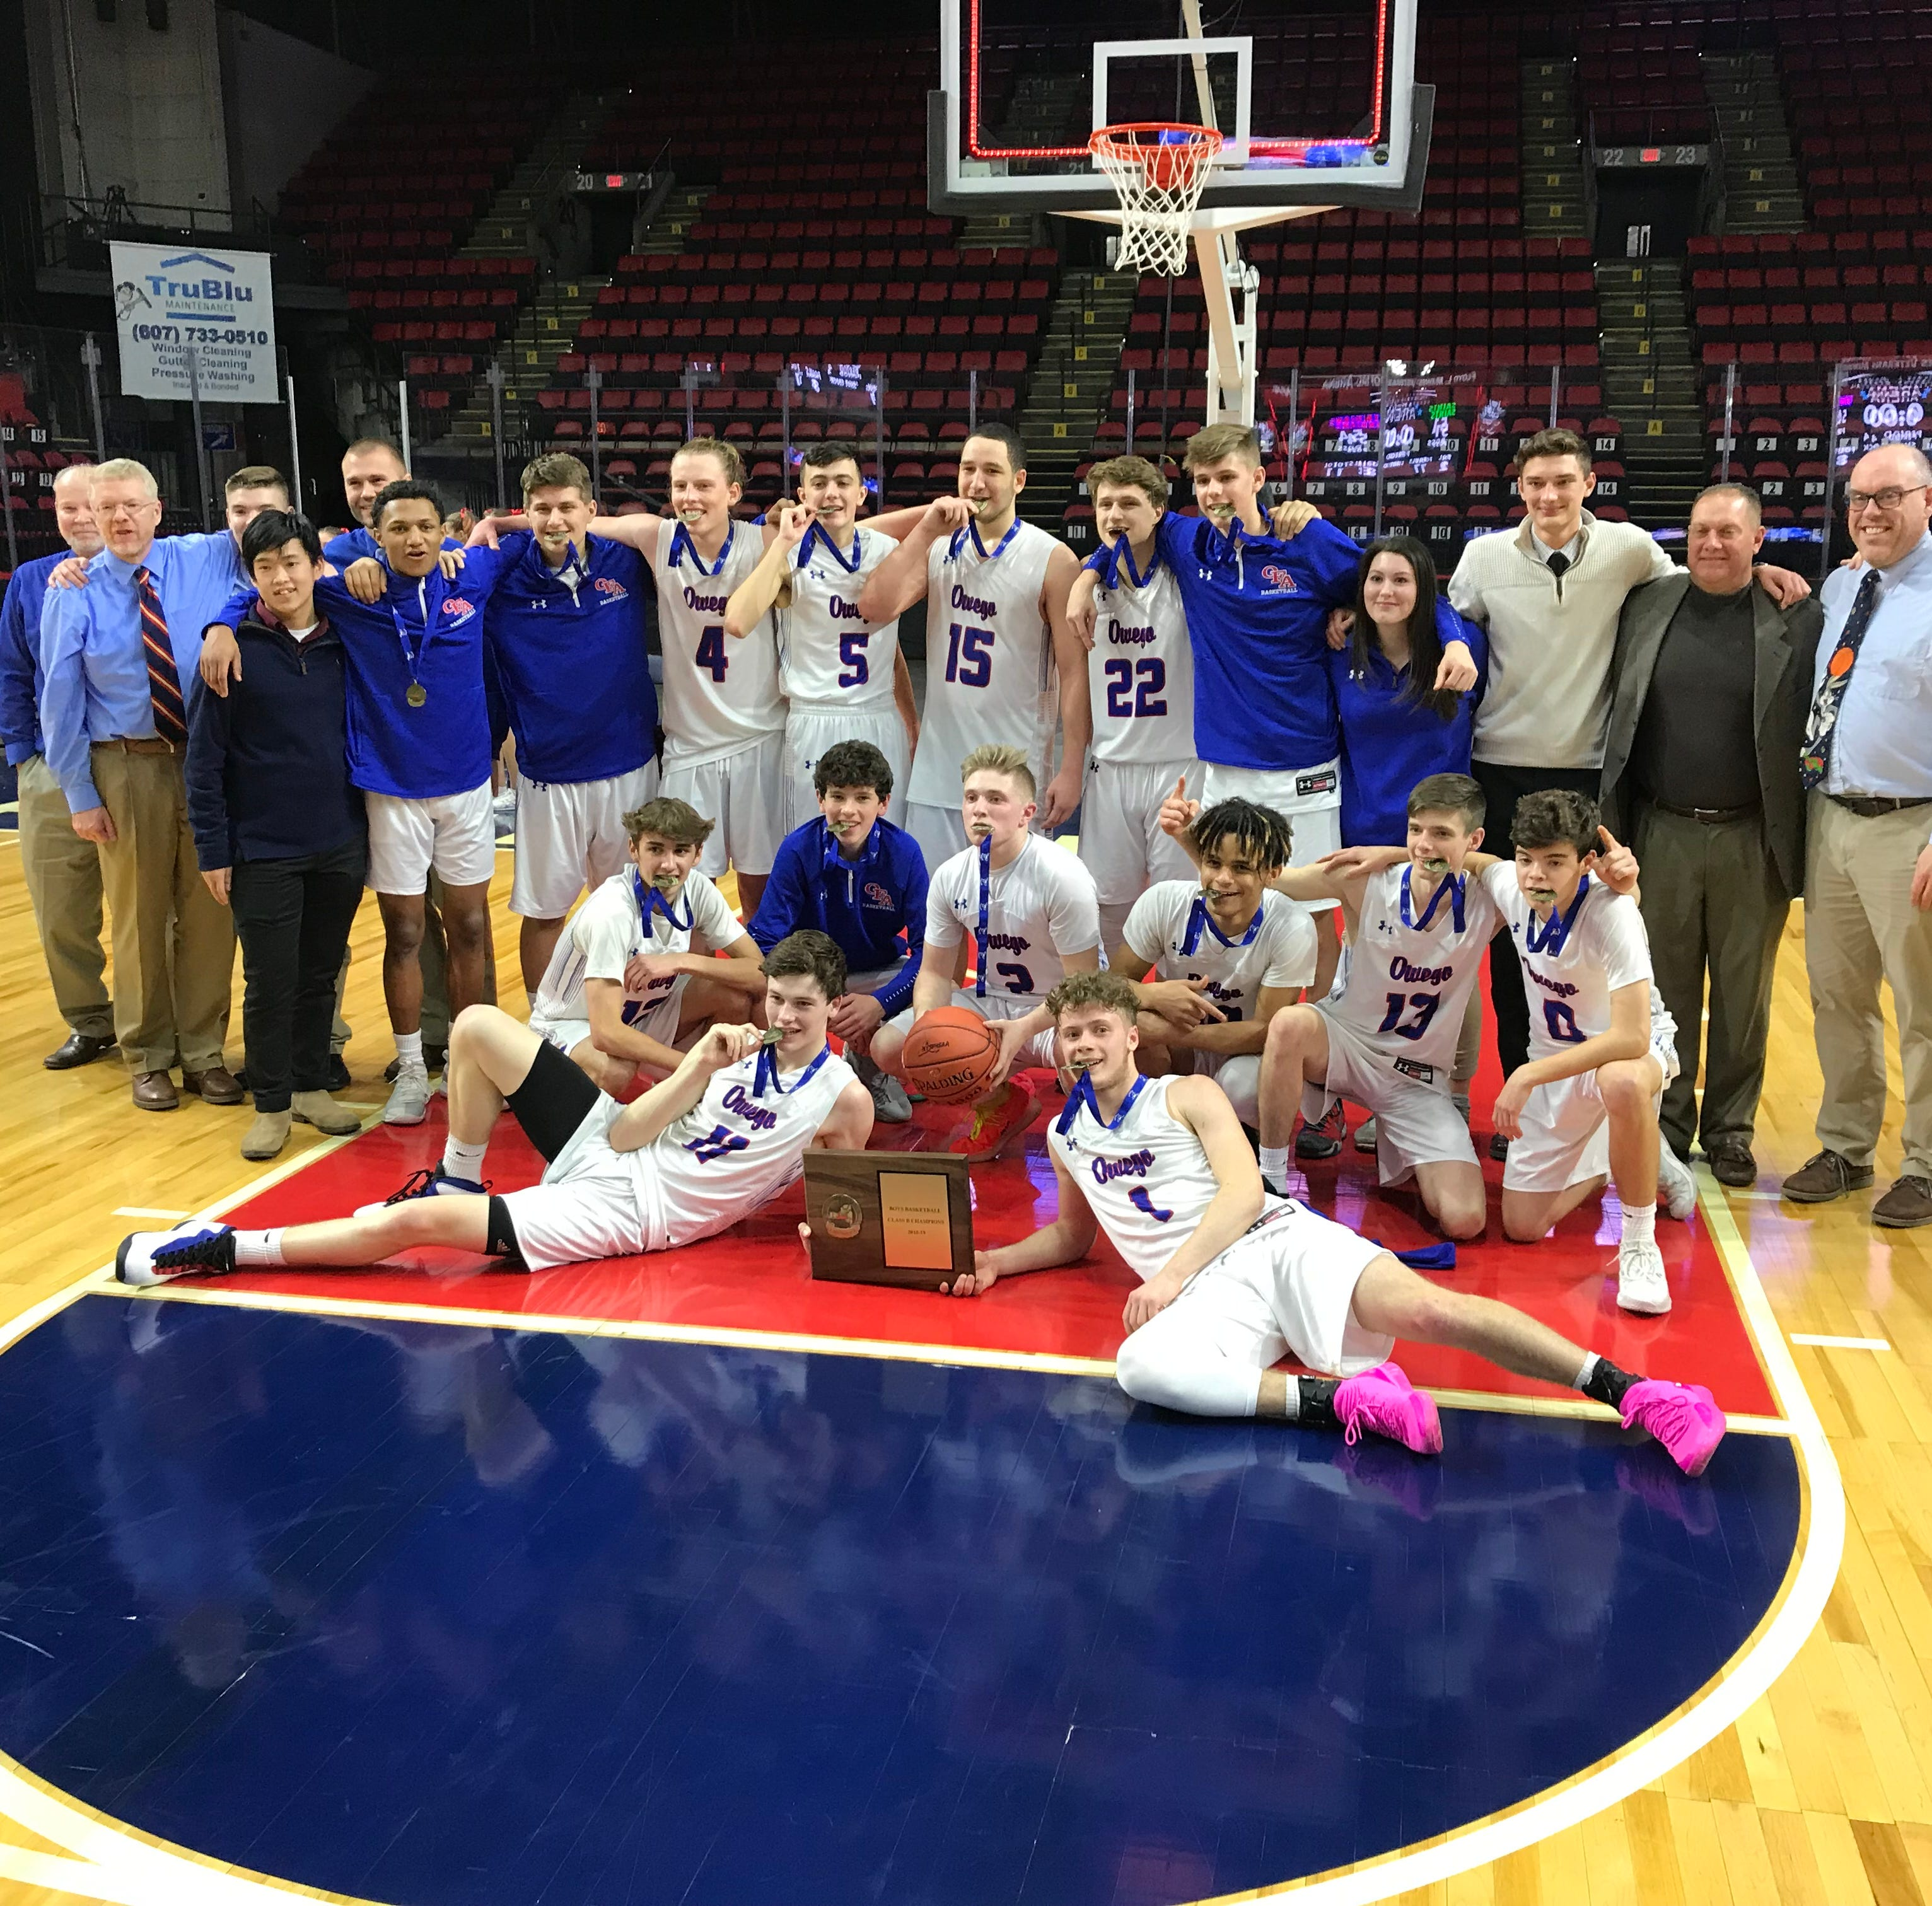 Boys Basketball: Owego takes down Seton CC for Class B title